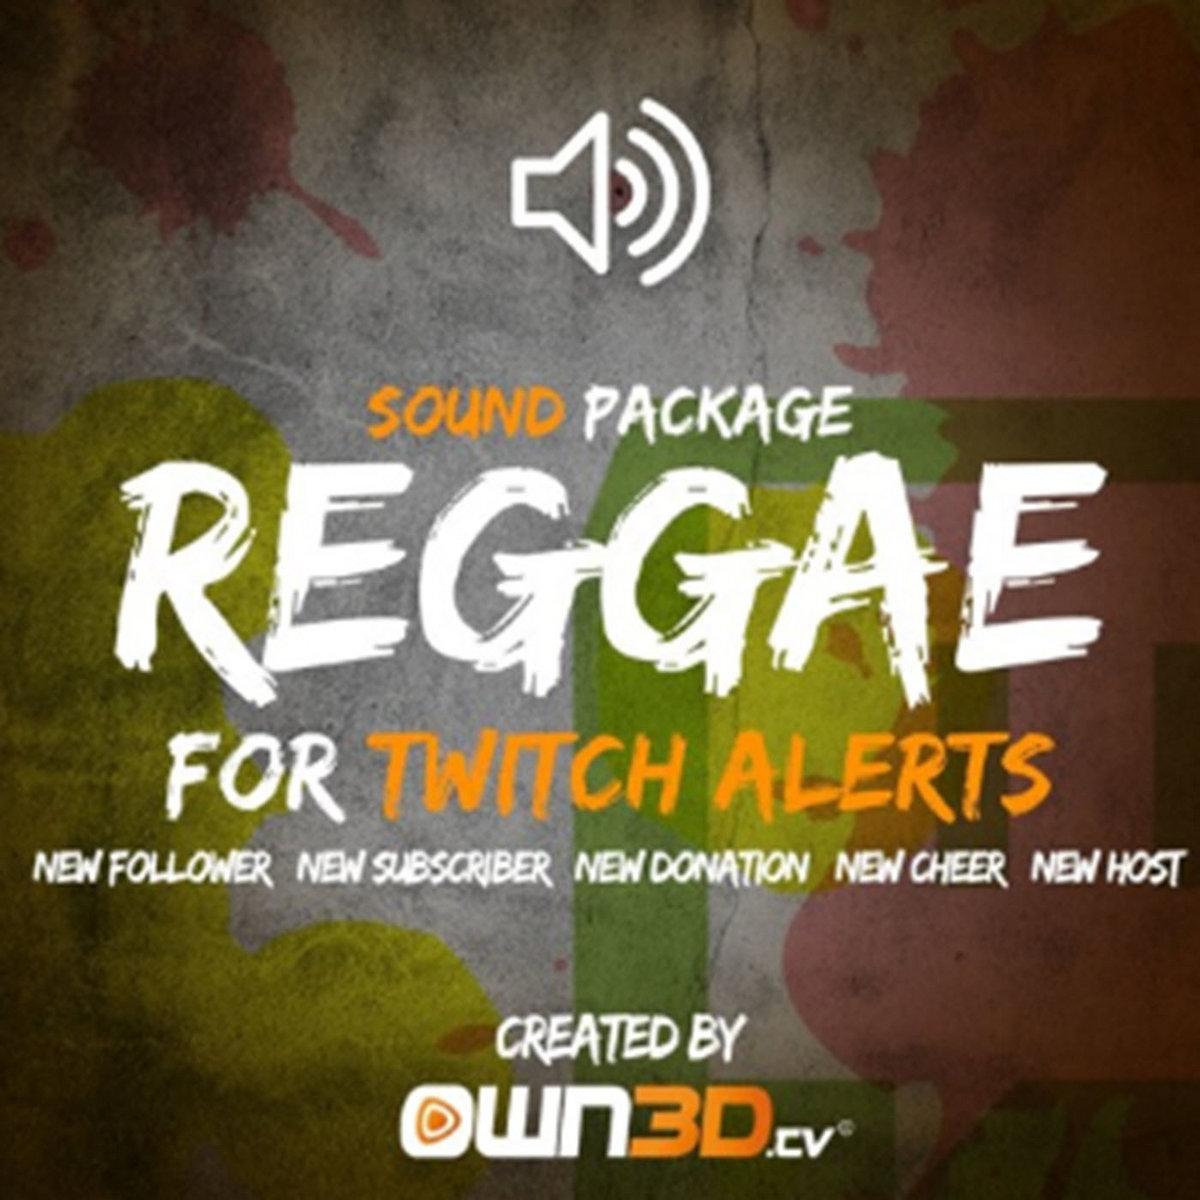 Download twitch alert sounds | Peatix